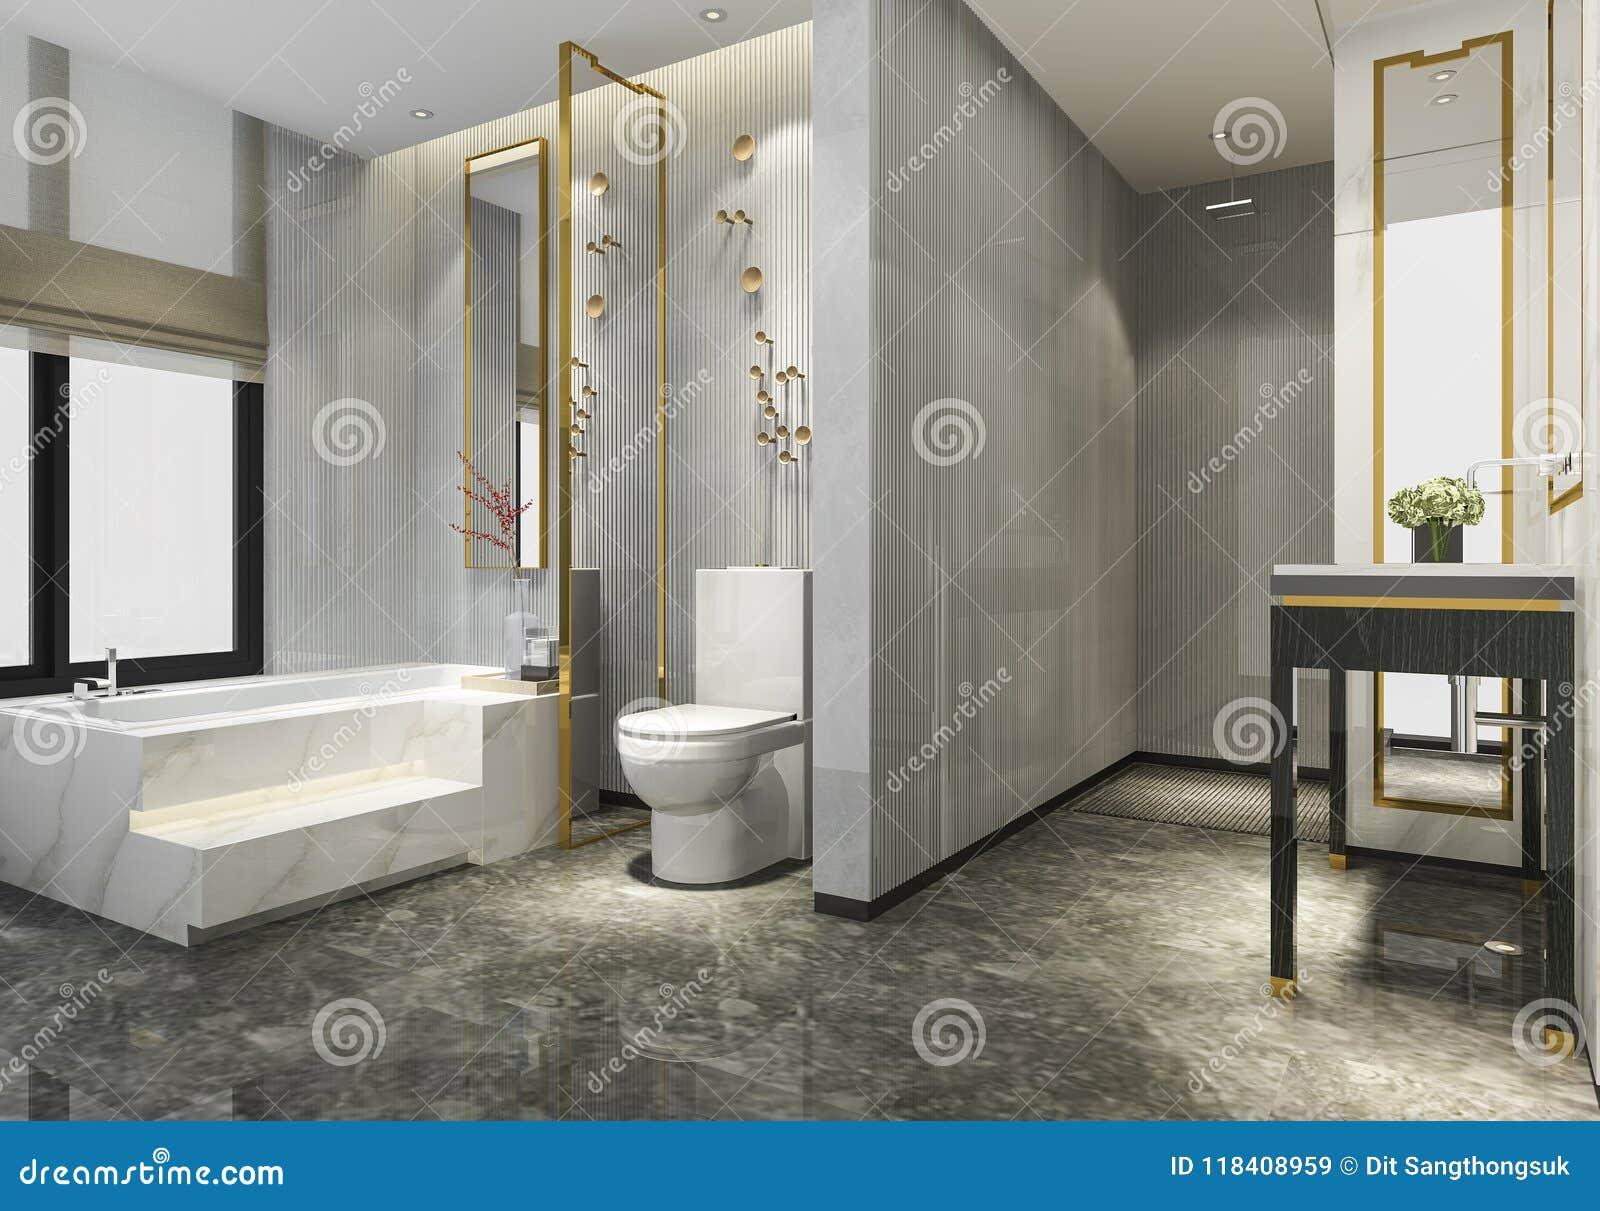 3d Rendering Luxury Modern Design Bathroom And Toilet Stock